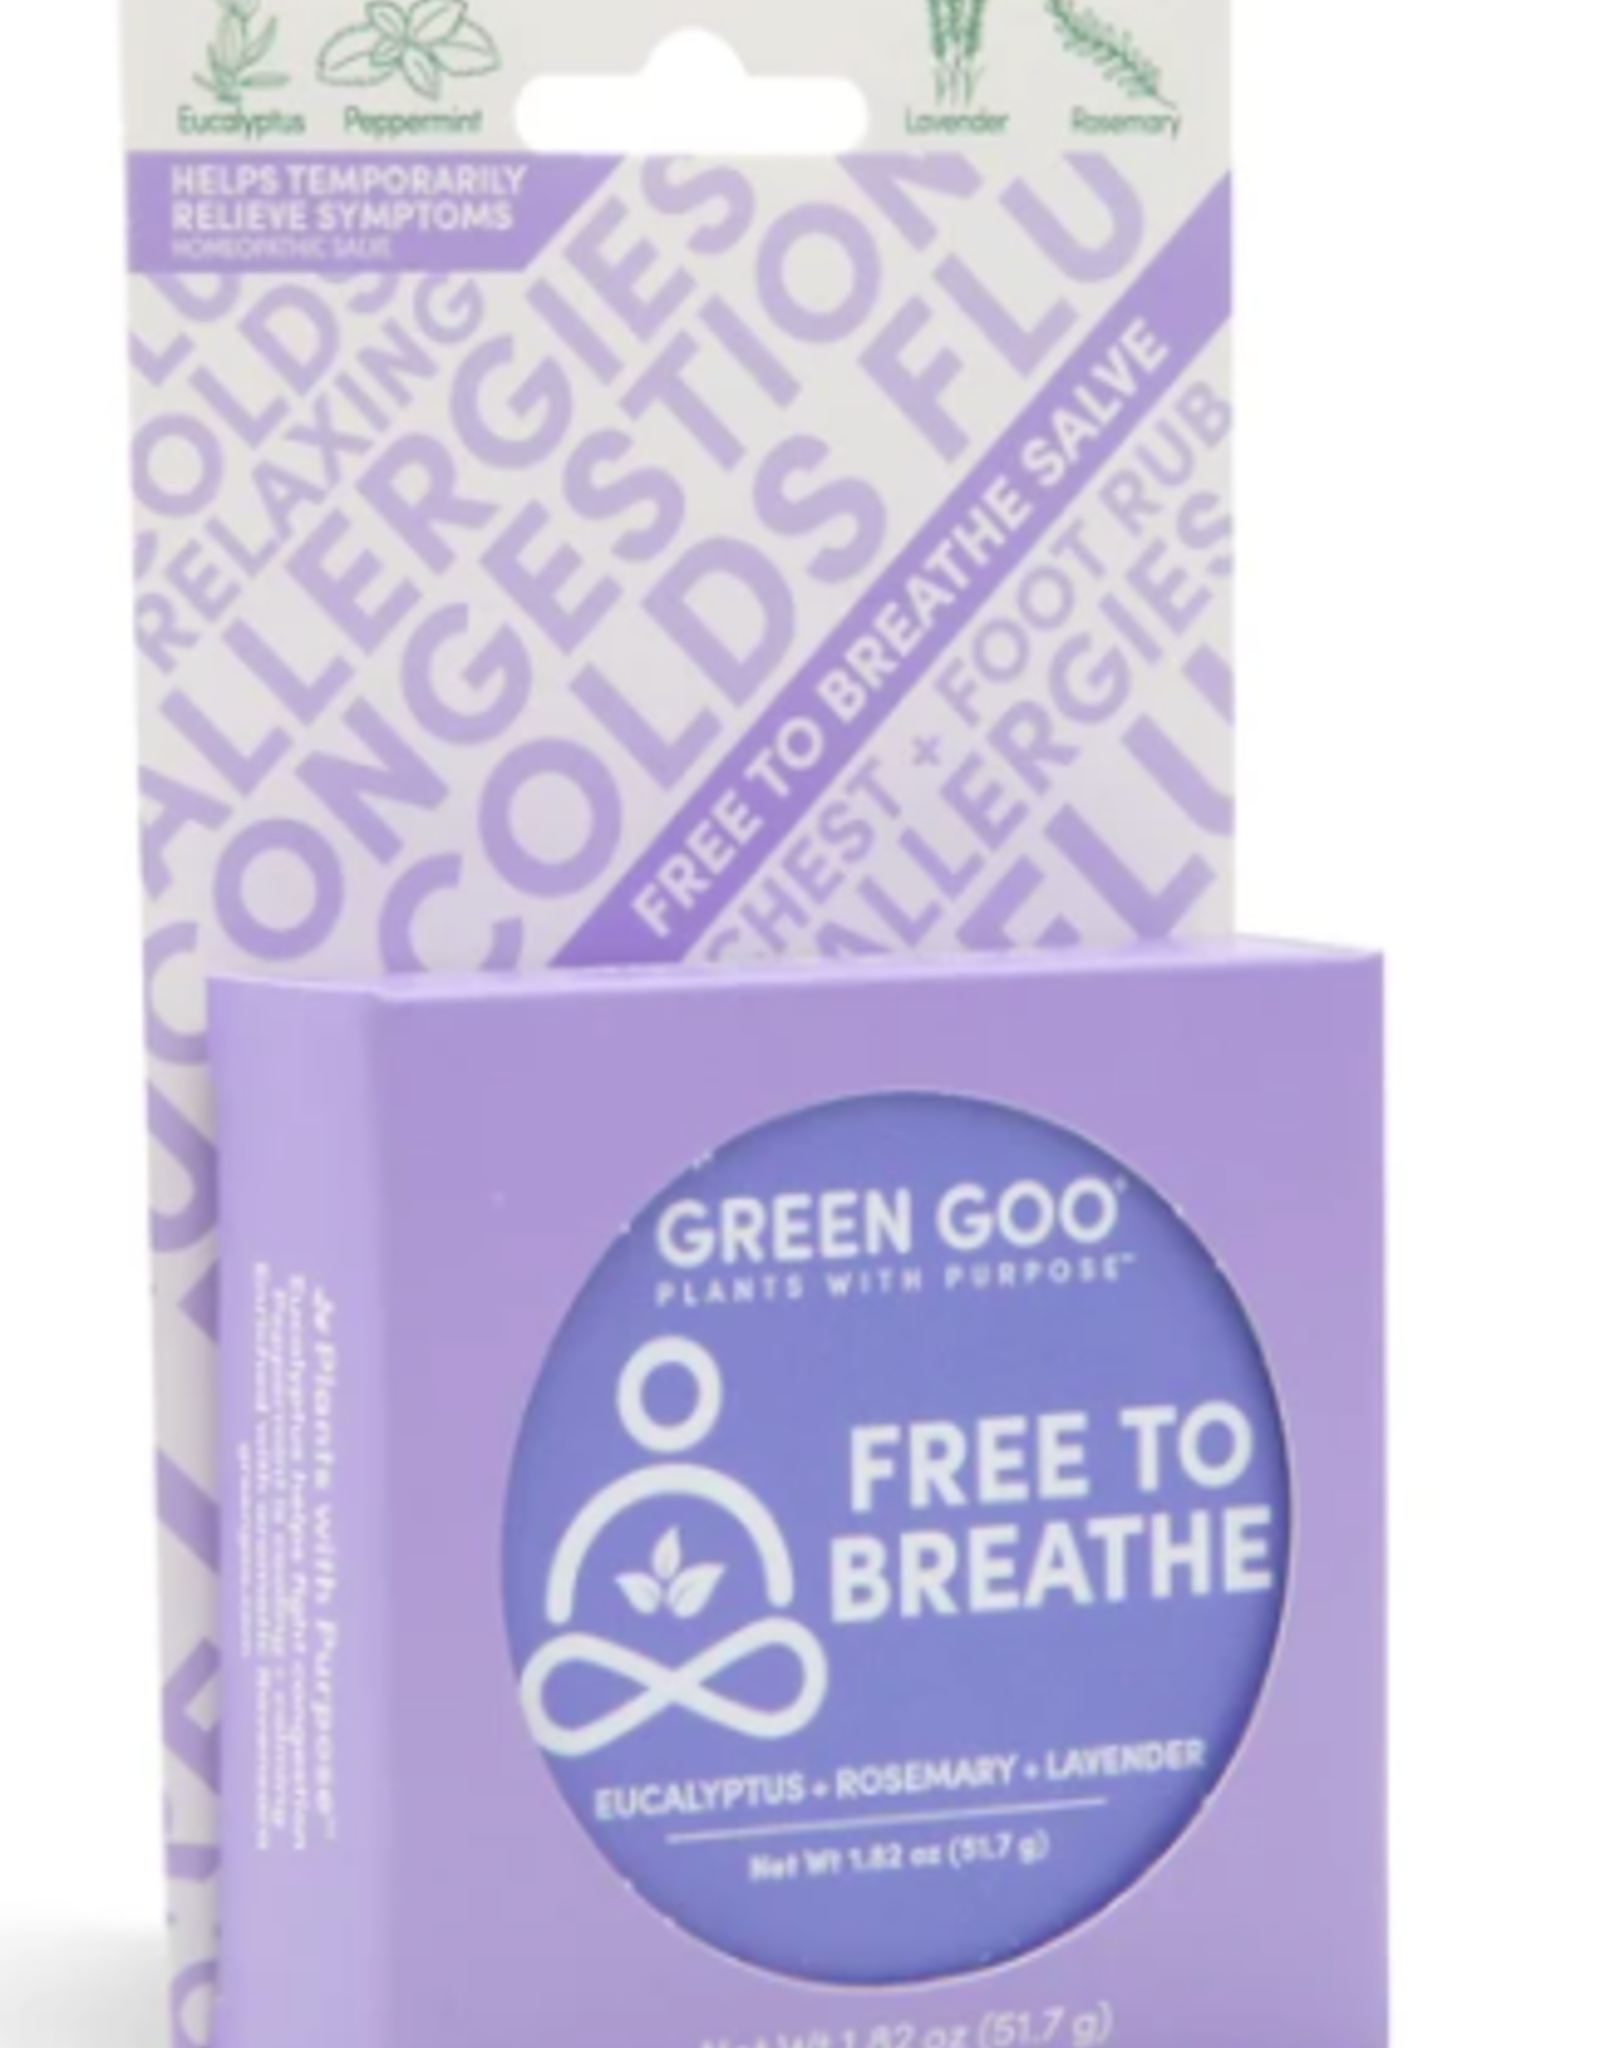 Green Goo Free to Breathe